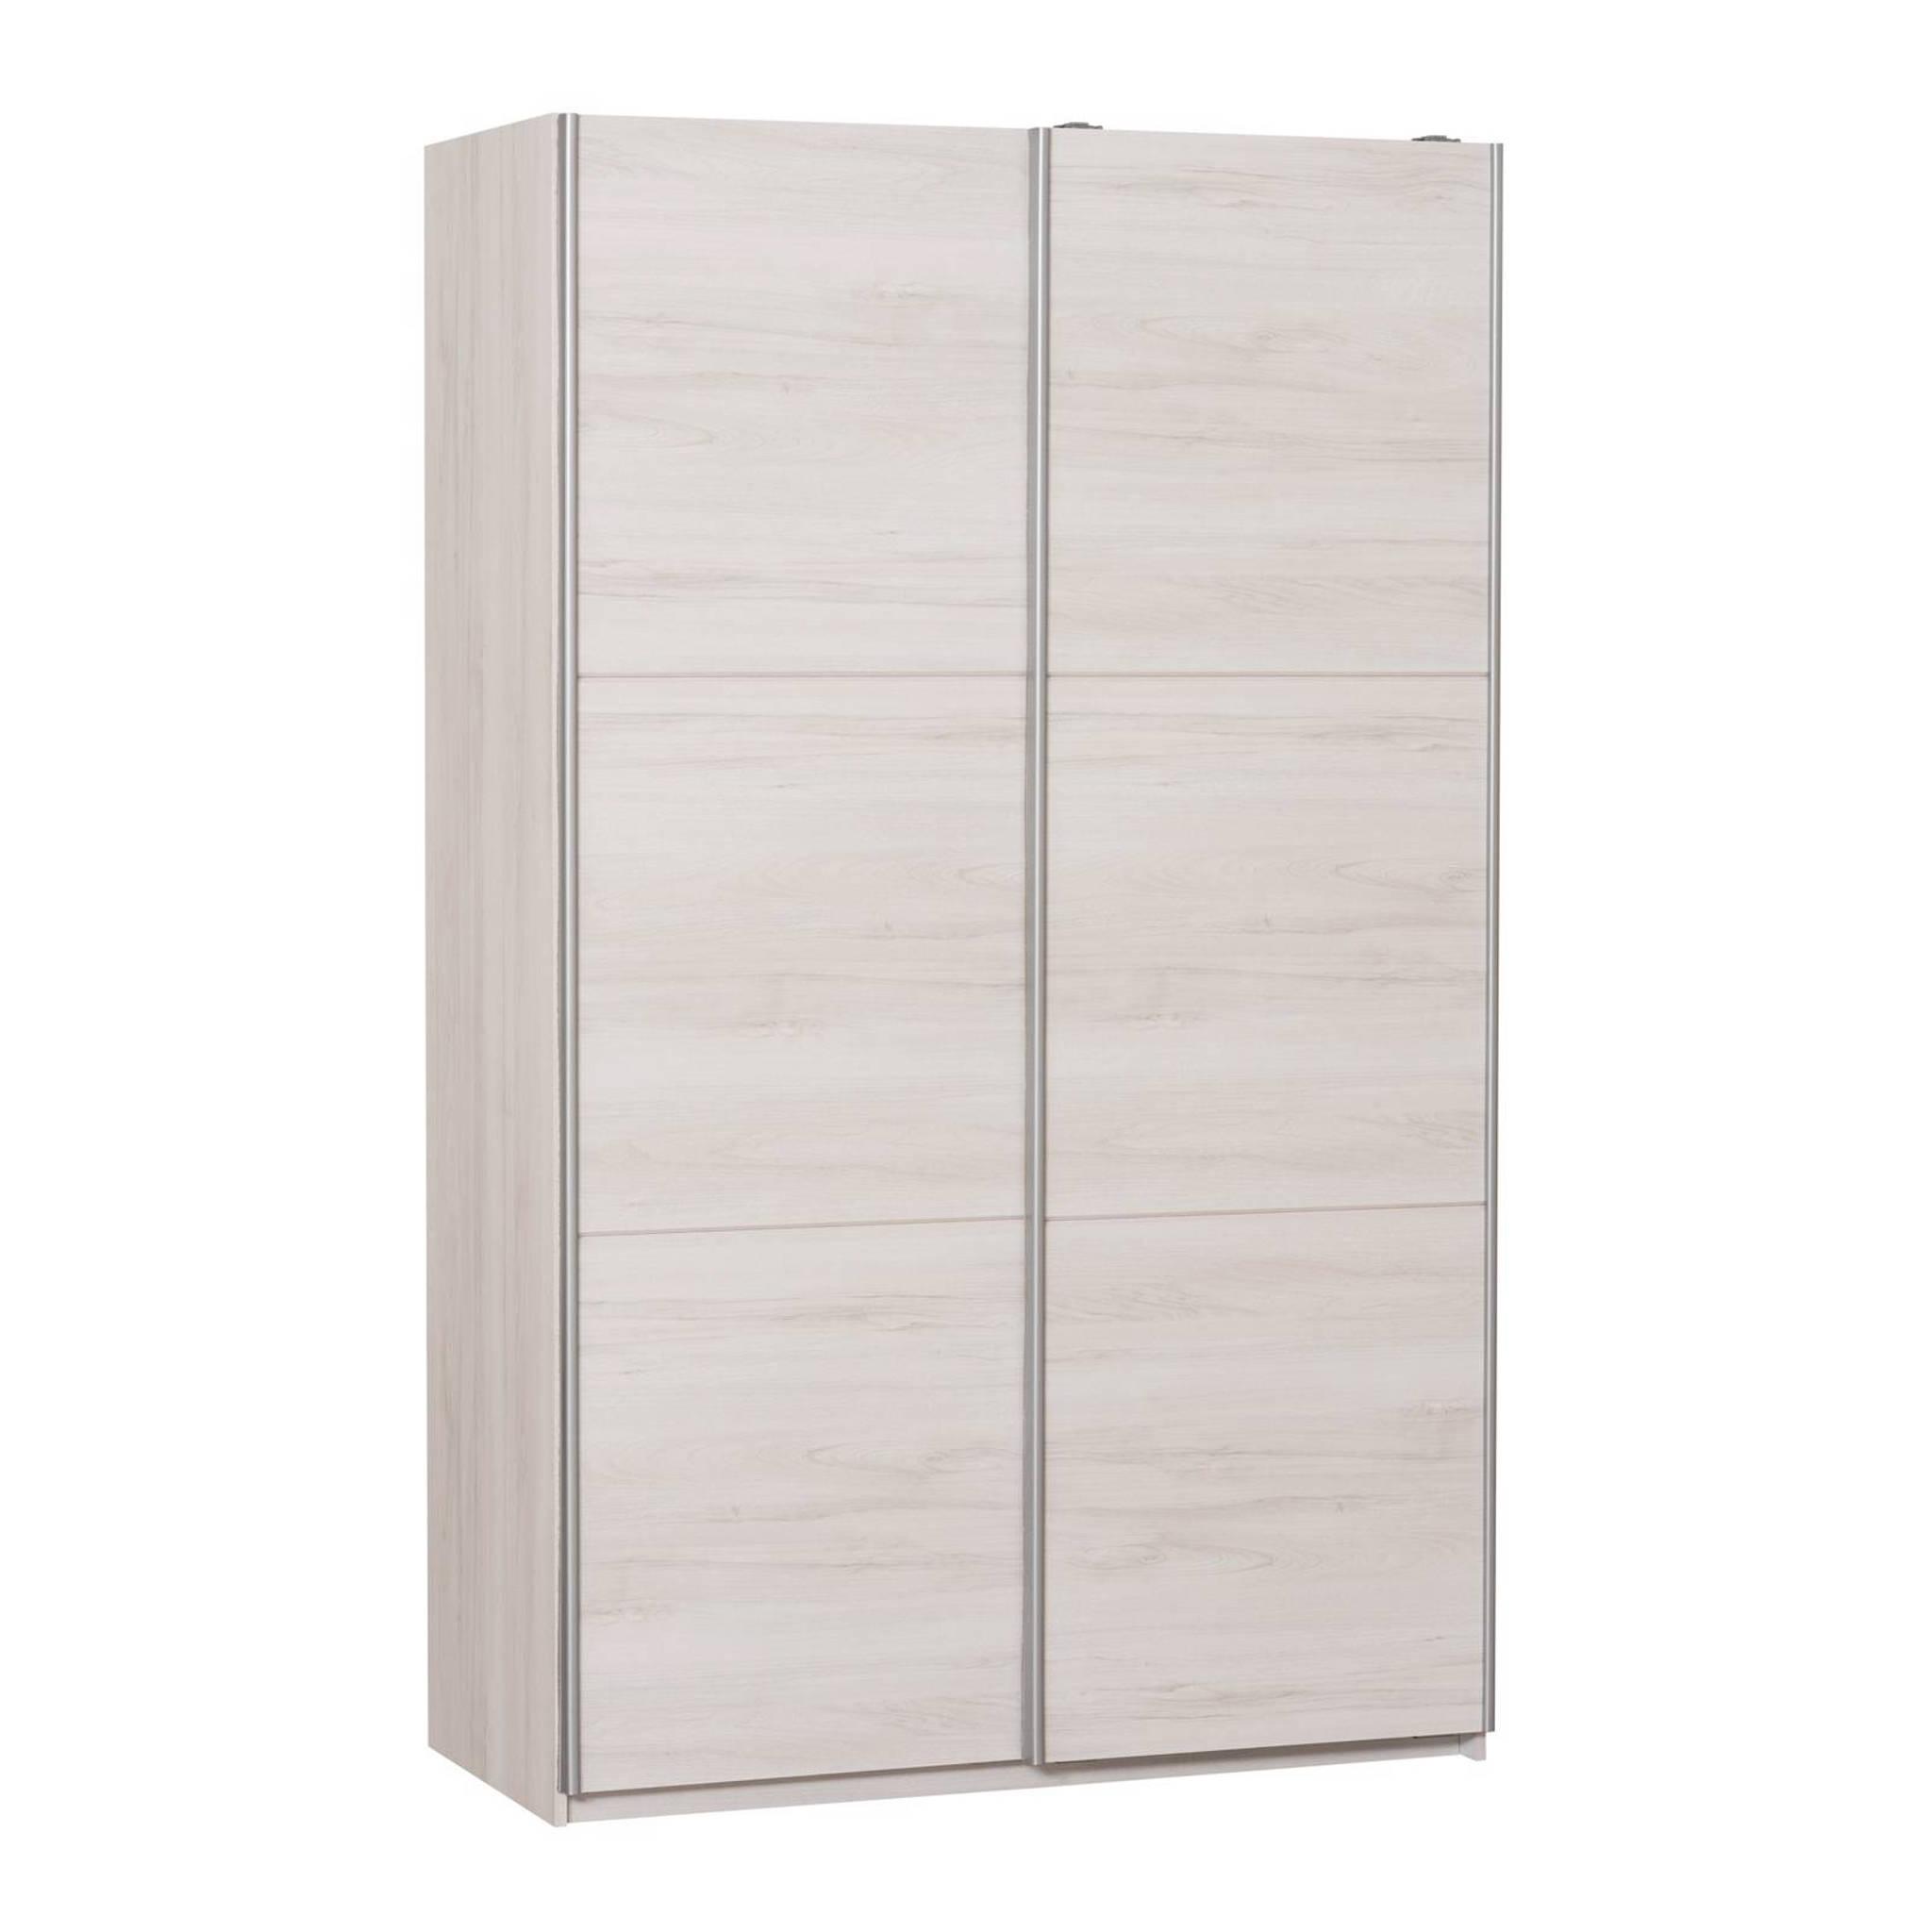 White Wash Hangkast.True Furniture Kledingkast Lucca Wehkamp